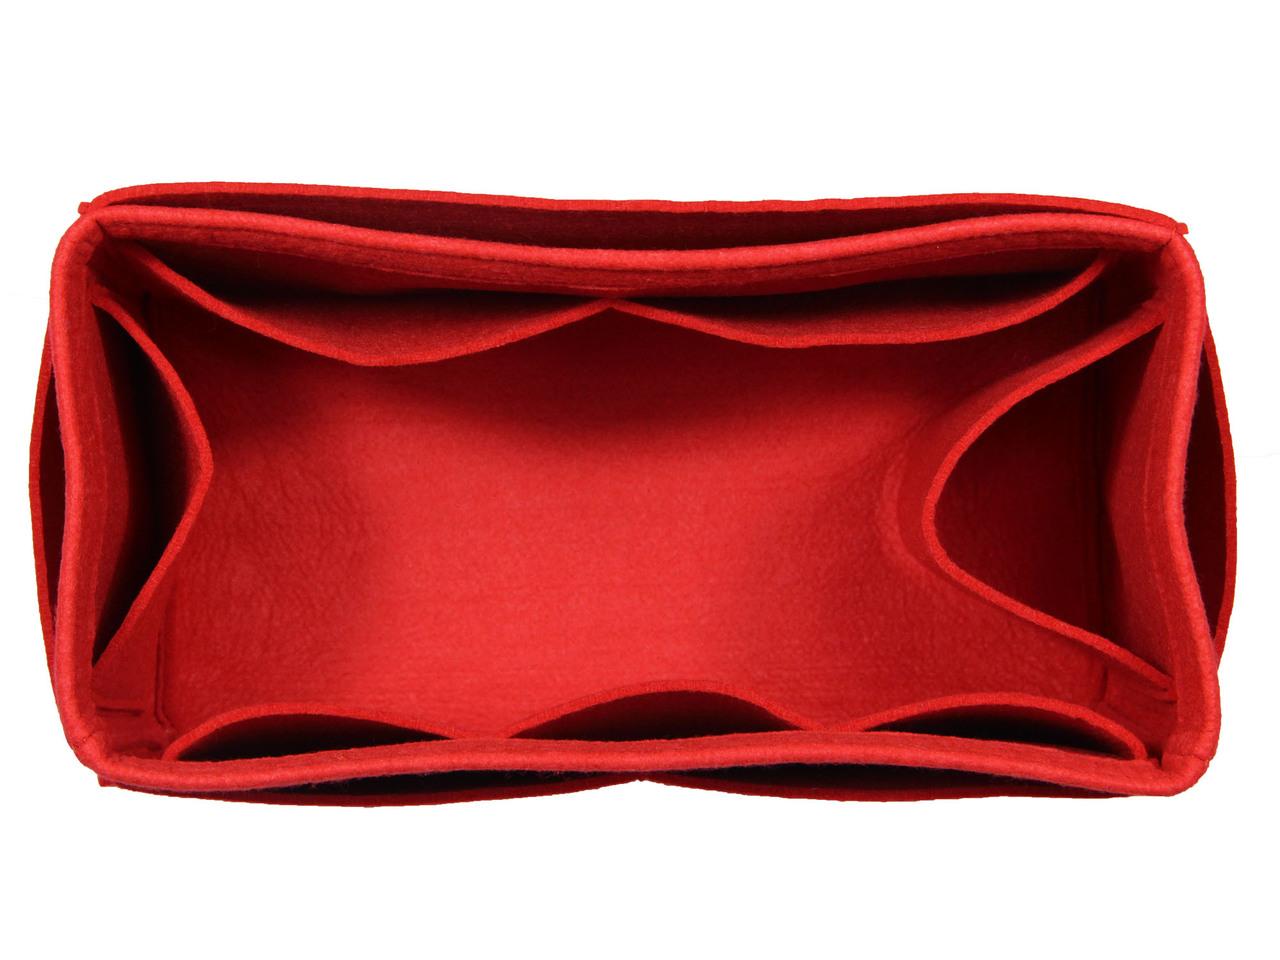 bc2b969fd71c Customizable Felt Tote Bag Organizer